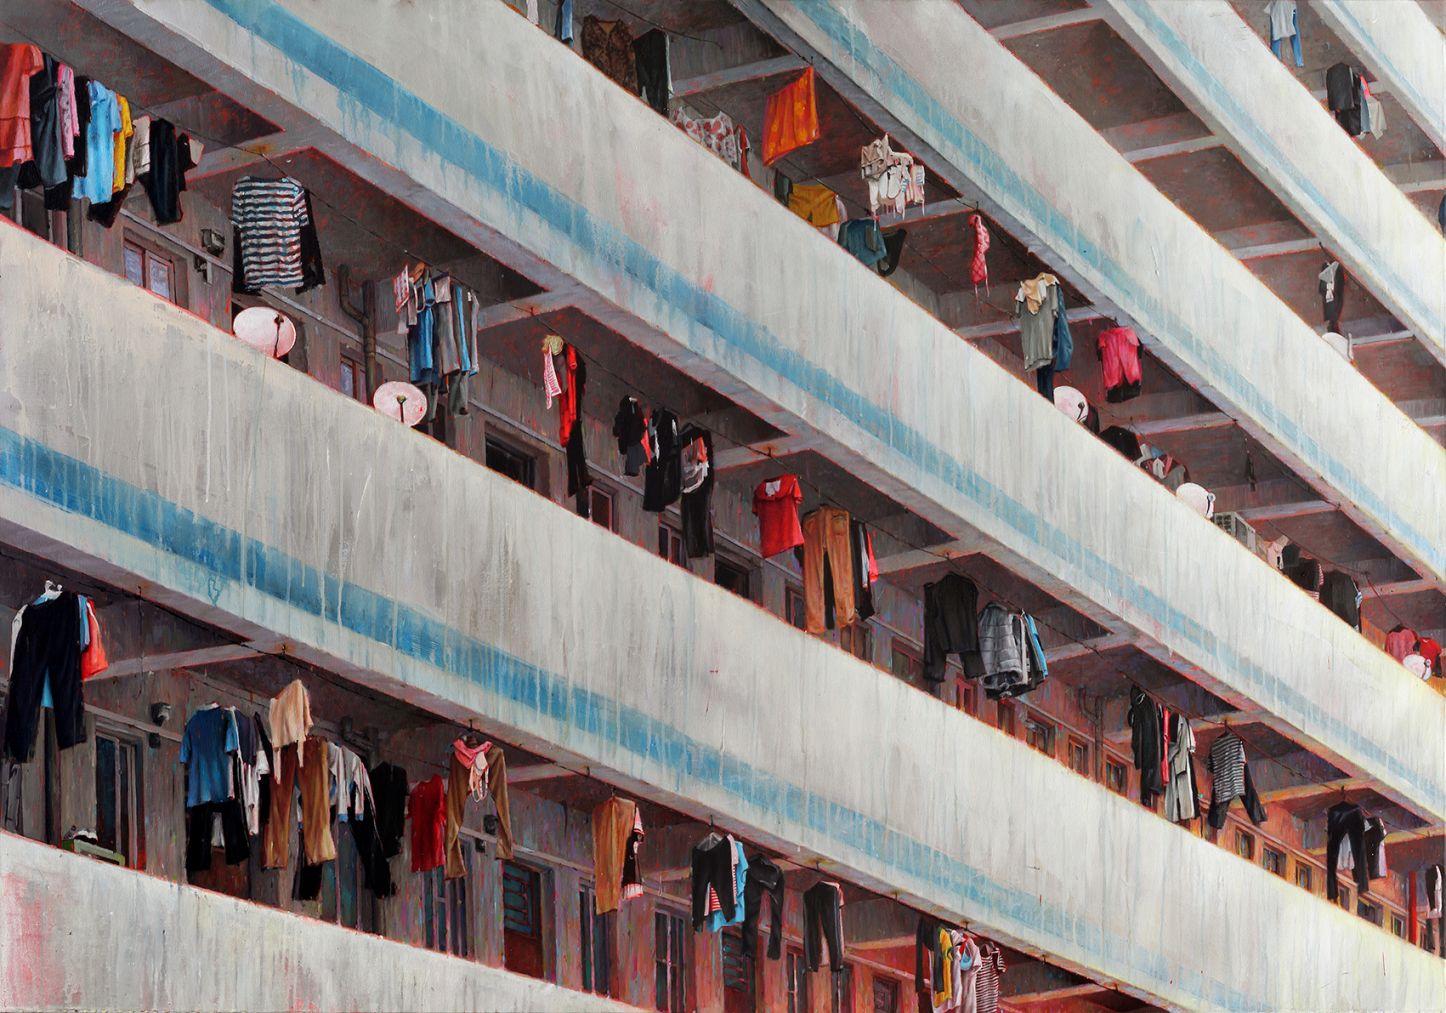 Factory Housing (2014) - David Agenjo